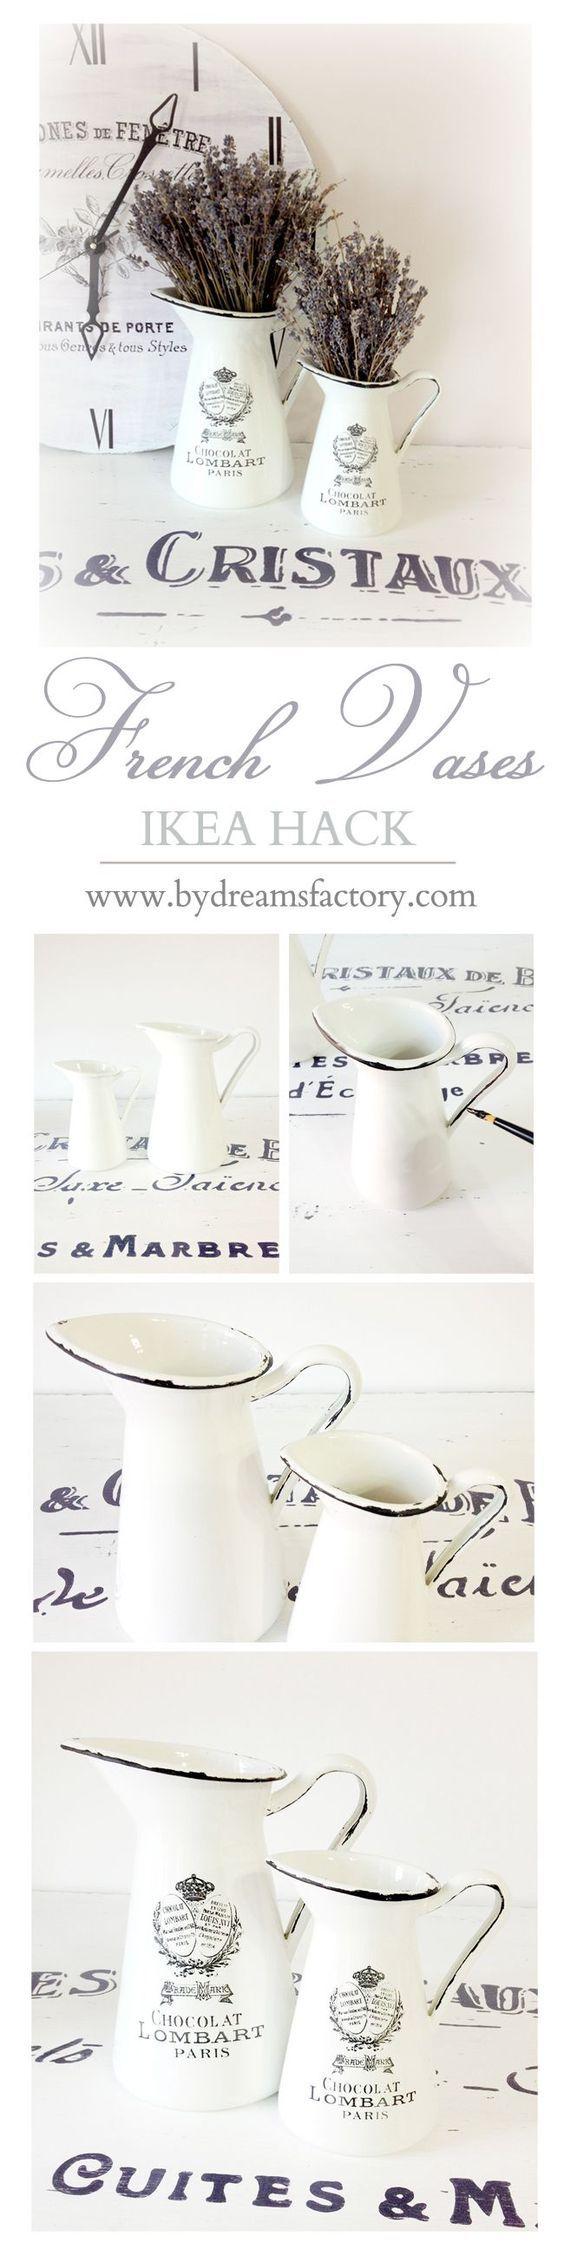 DIY: French Vases (Ikea hack) / Tutorial: Vaze frantuzesti (transformare Ikea)  | Dreams Factory http://www.bydreamsfactory.com/2015/07/diy-french-vases-ikea-hack-tutorial.html